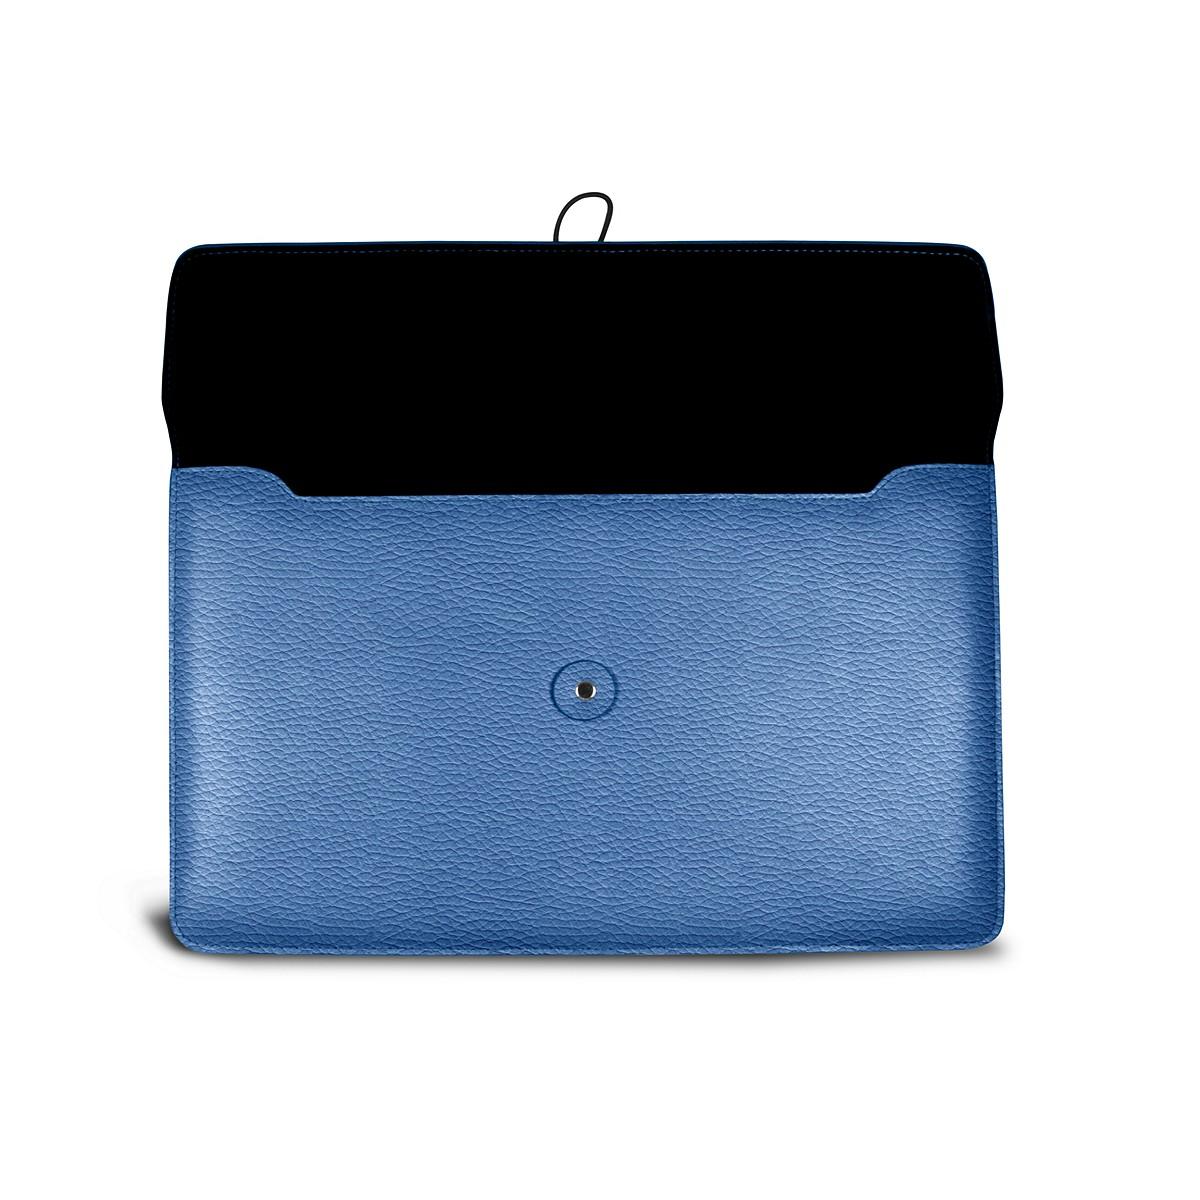 Ledertasche für MacBook Air 11 Zoll